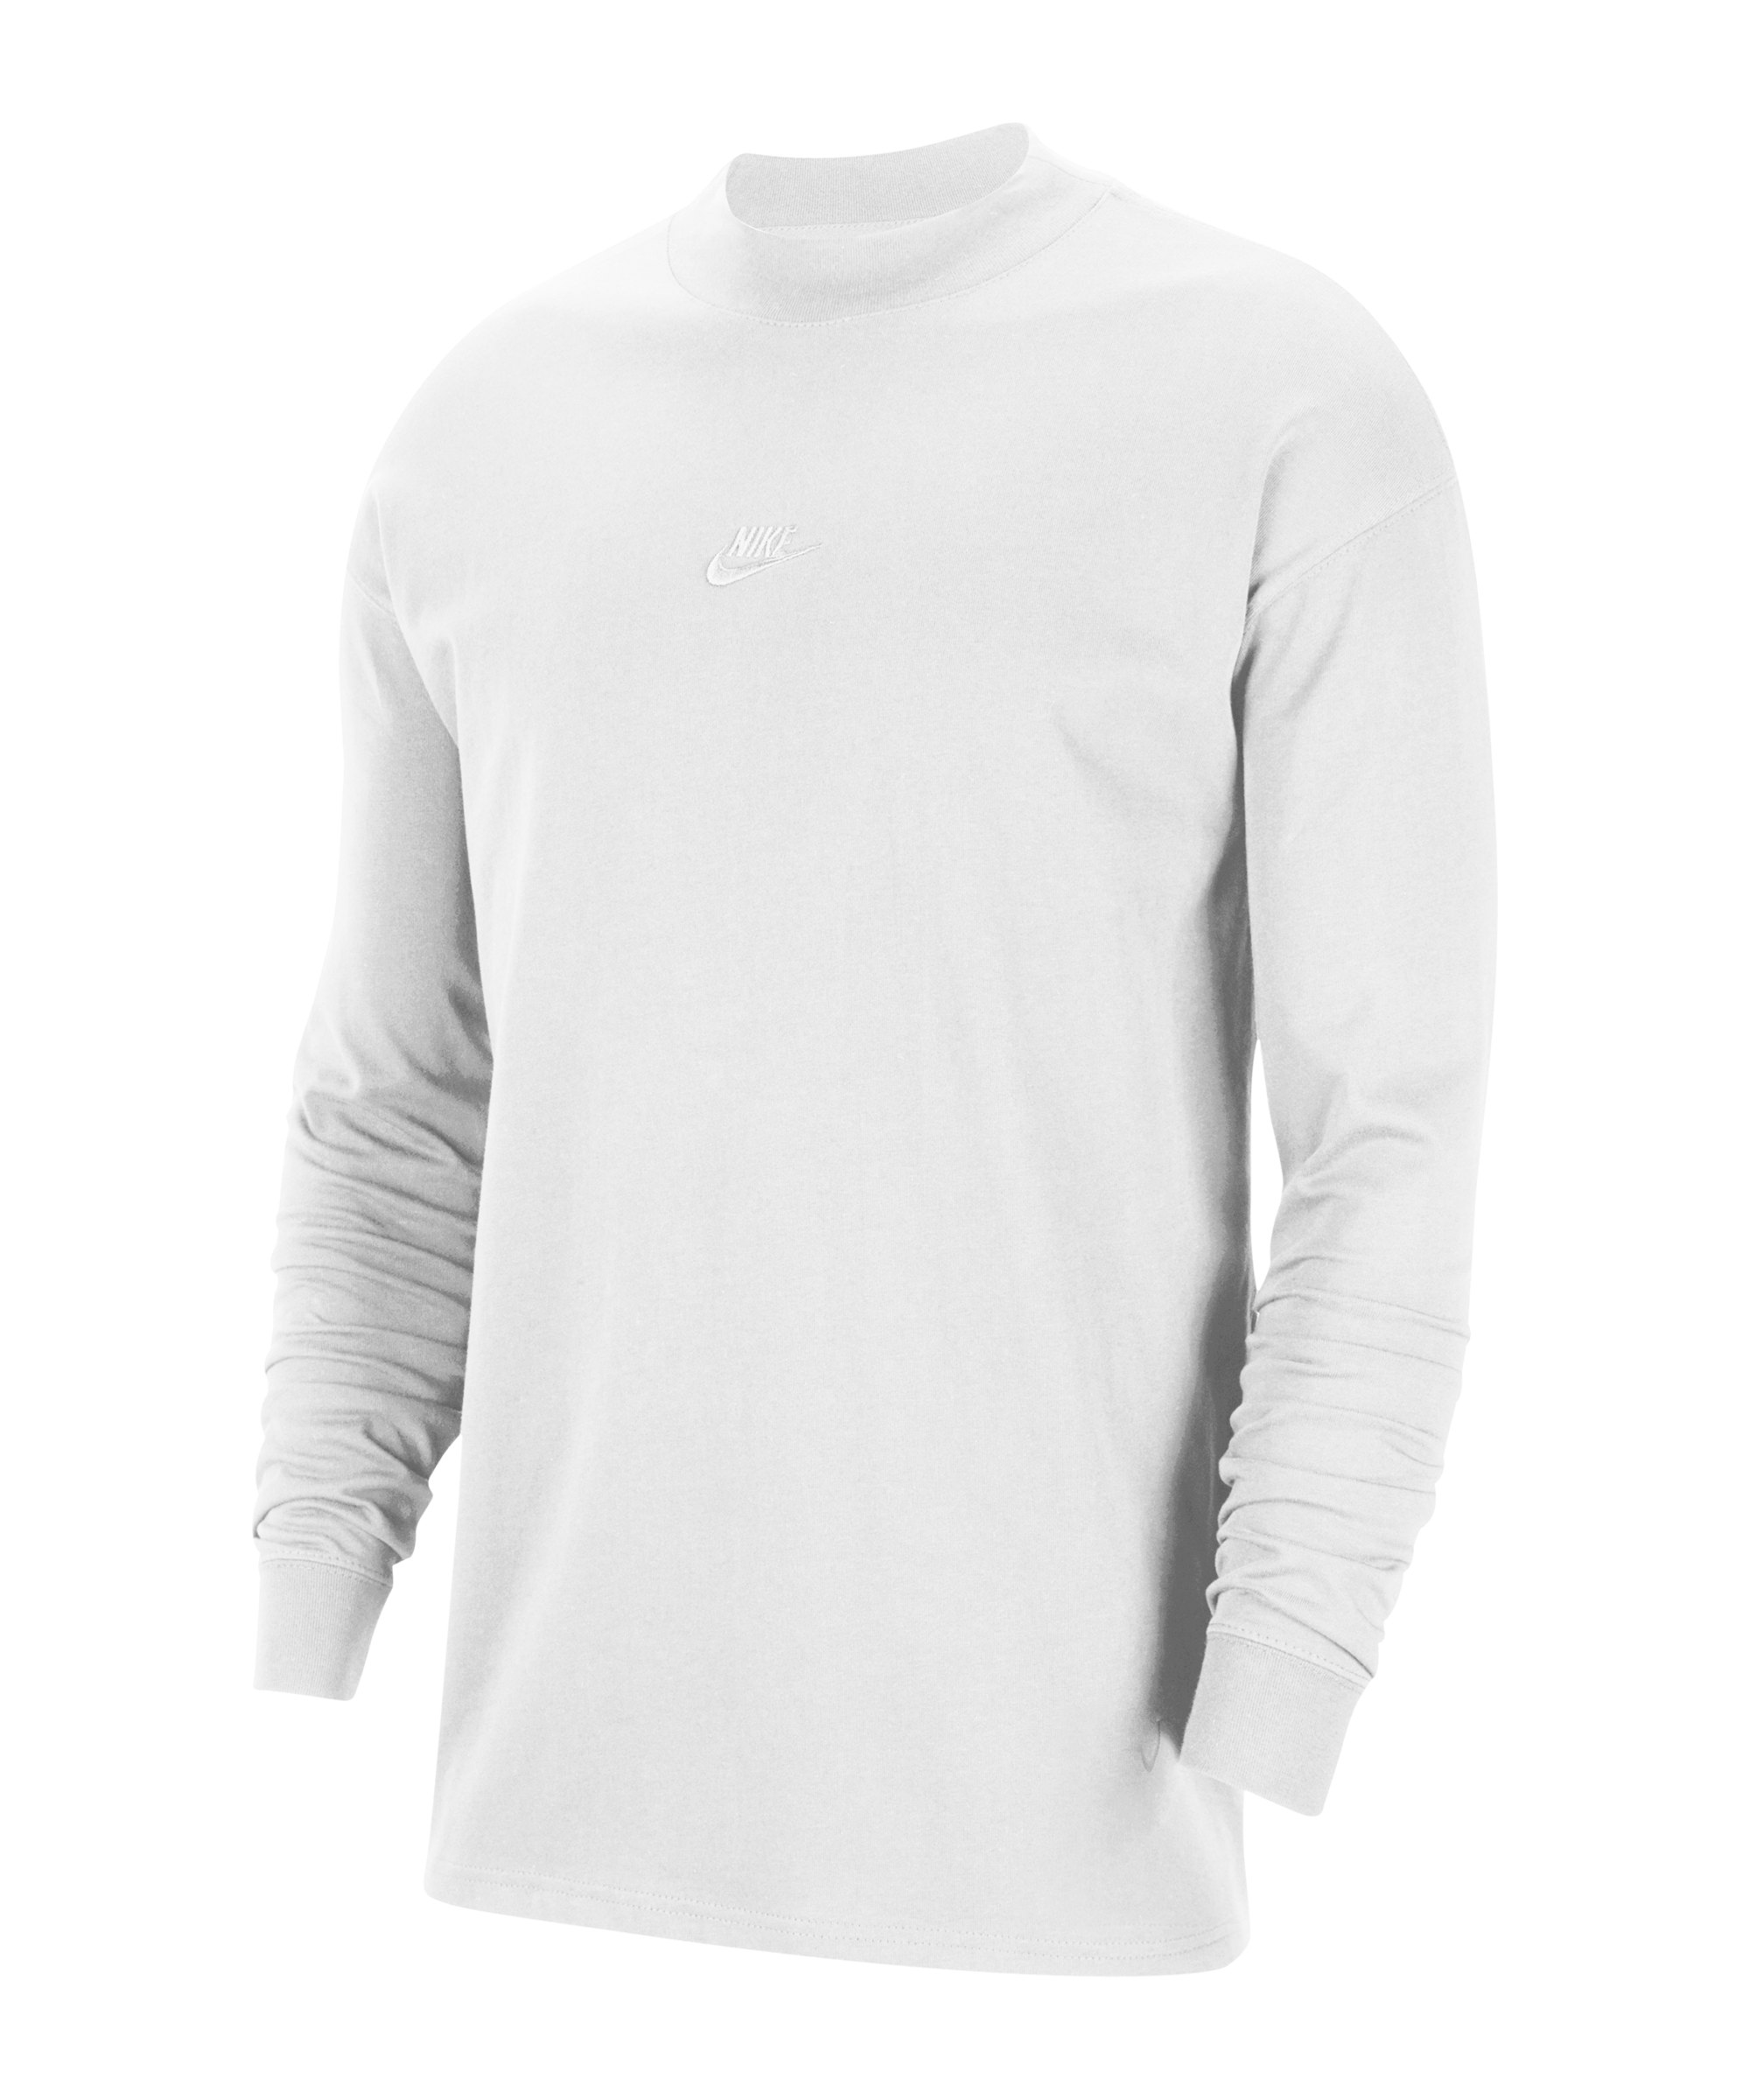 Nike Graphic Shirt langarm Weiss F100 - weiss